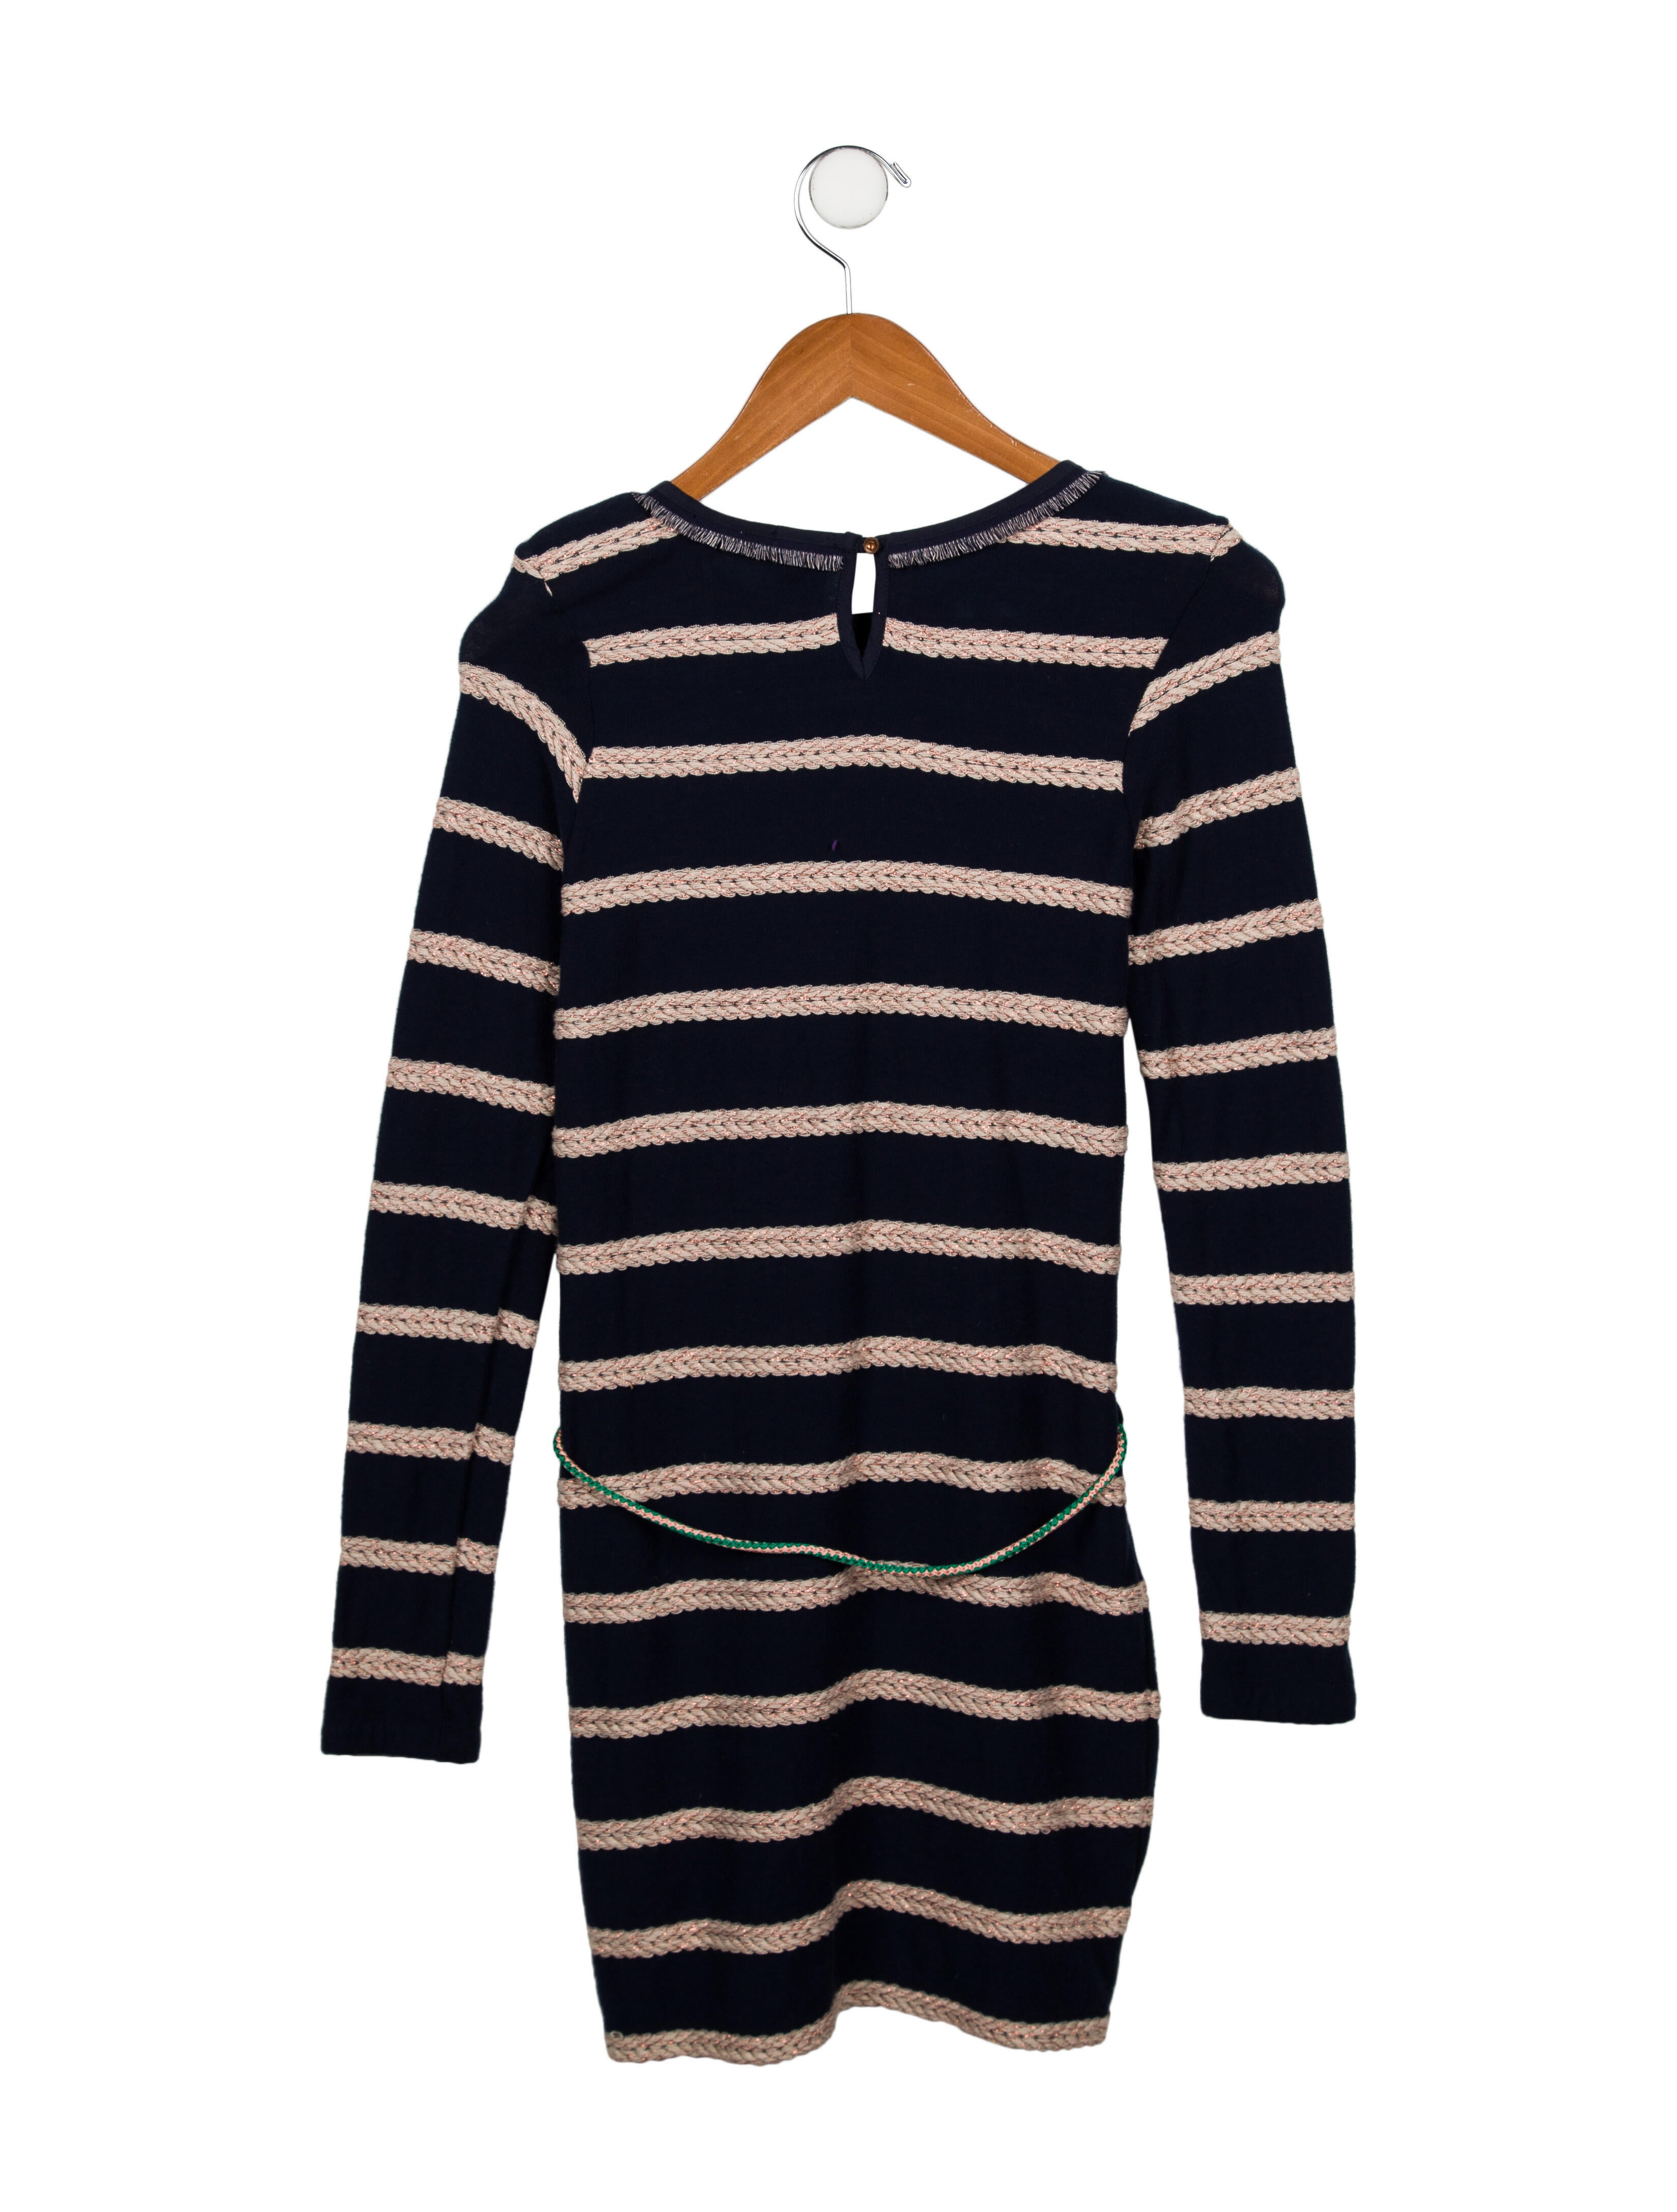 Scotch /& Soda Girls Corduroy Dungaree Dress